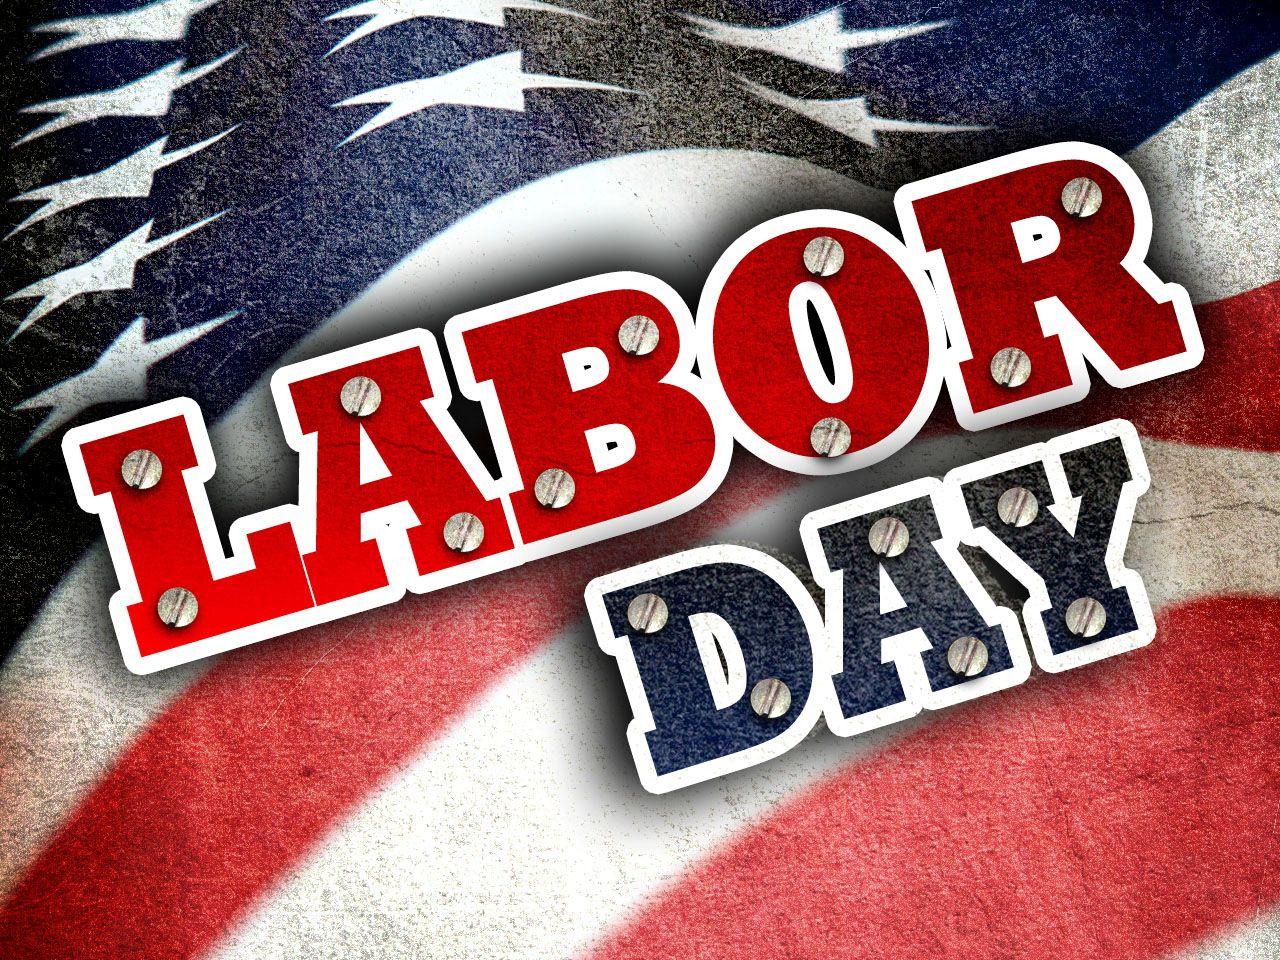 Elegant Happy Labor Day 2017 Images  . Ecards %252C%2Bof%2BLabor%2BDay%2BHappy%2BLabor%2BDay%